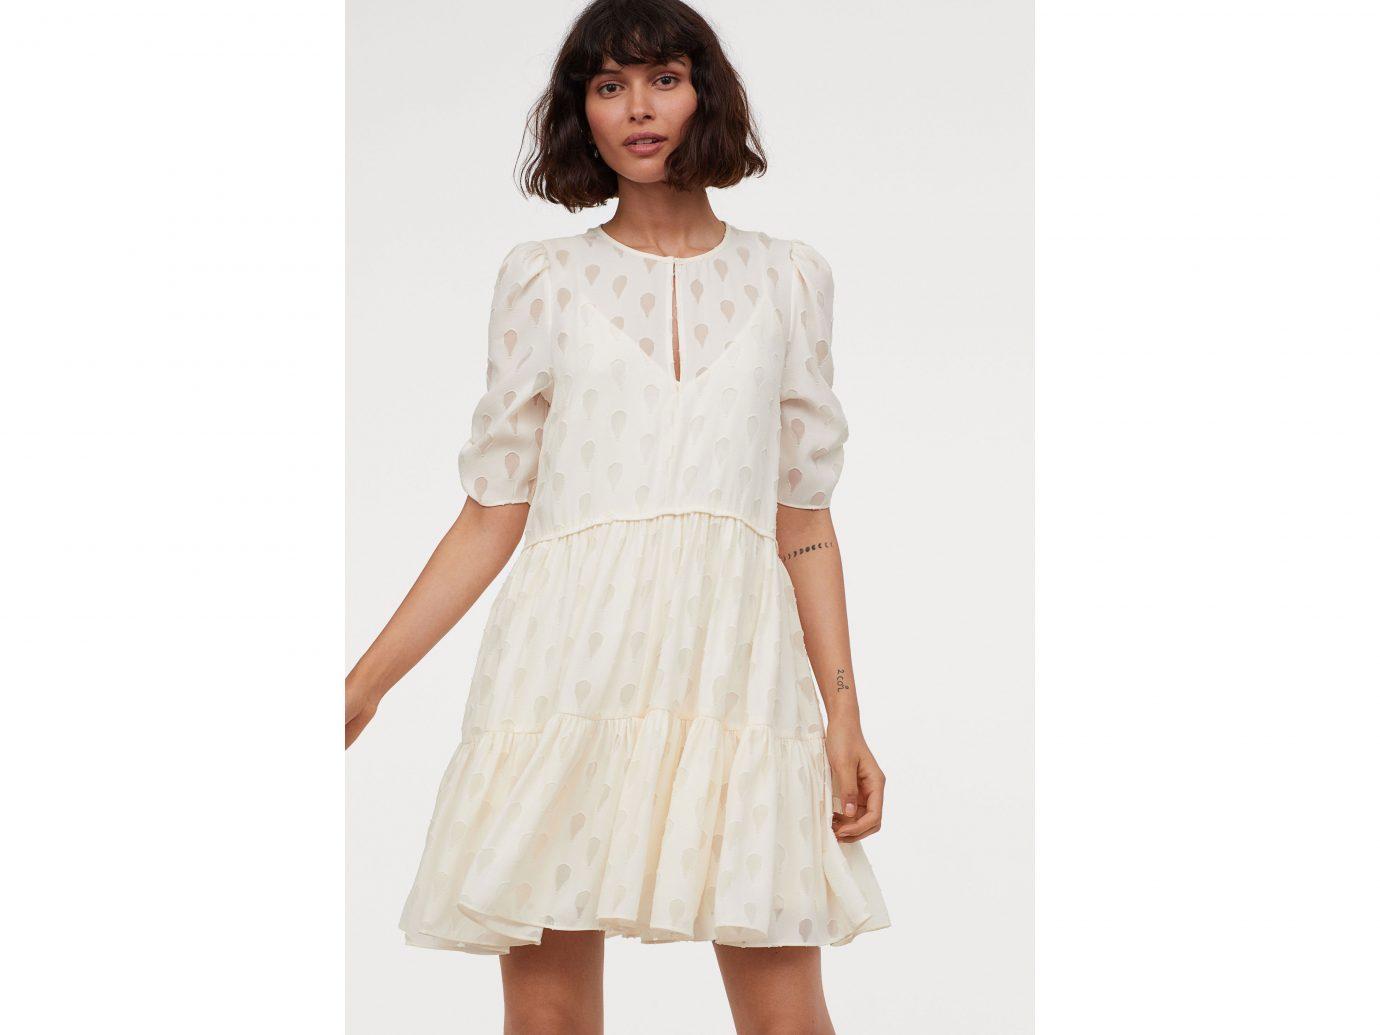 H&M Puff-sleeved Dress in cream